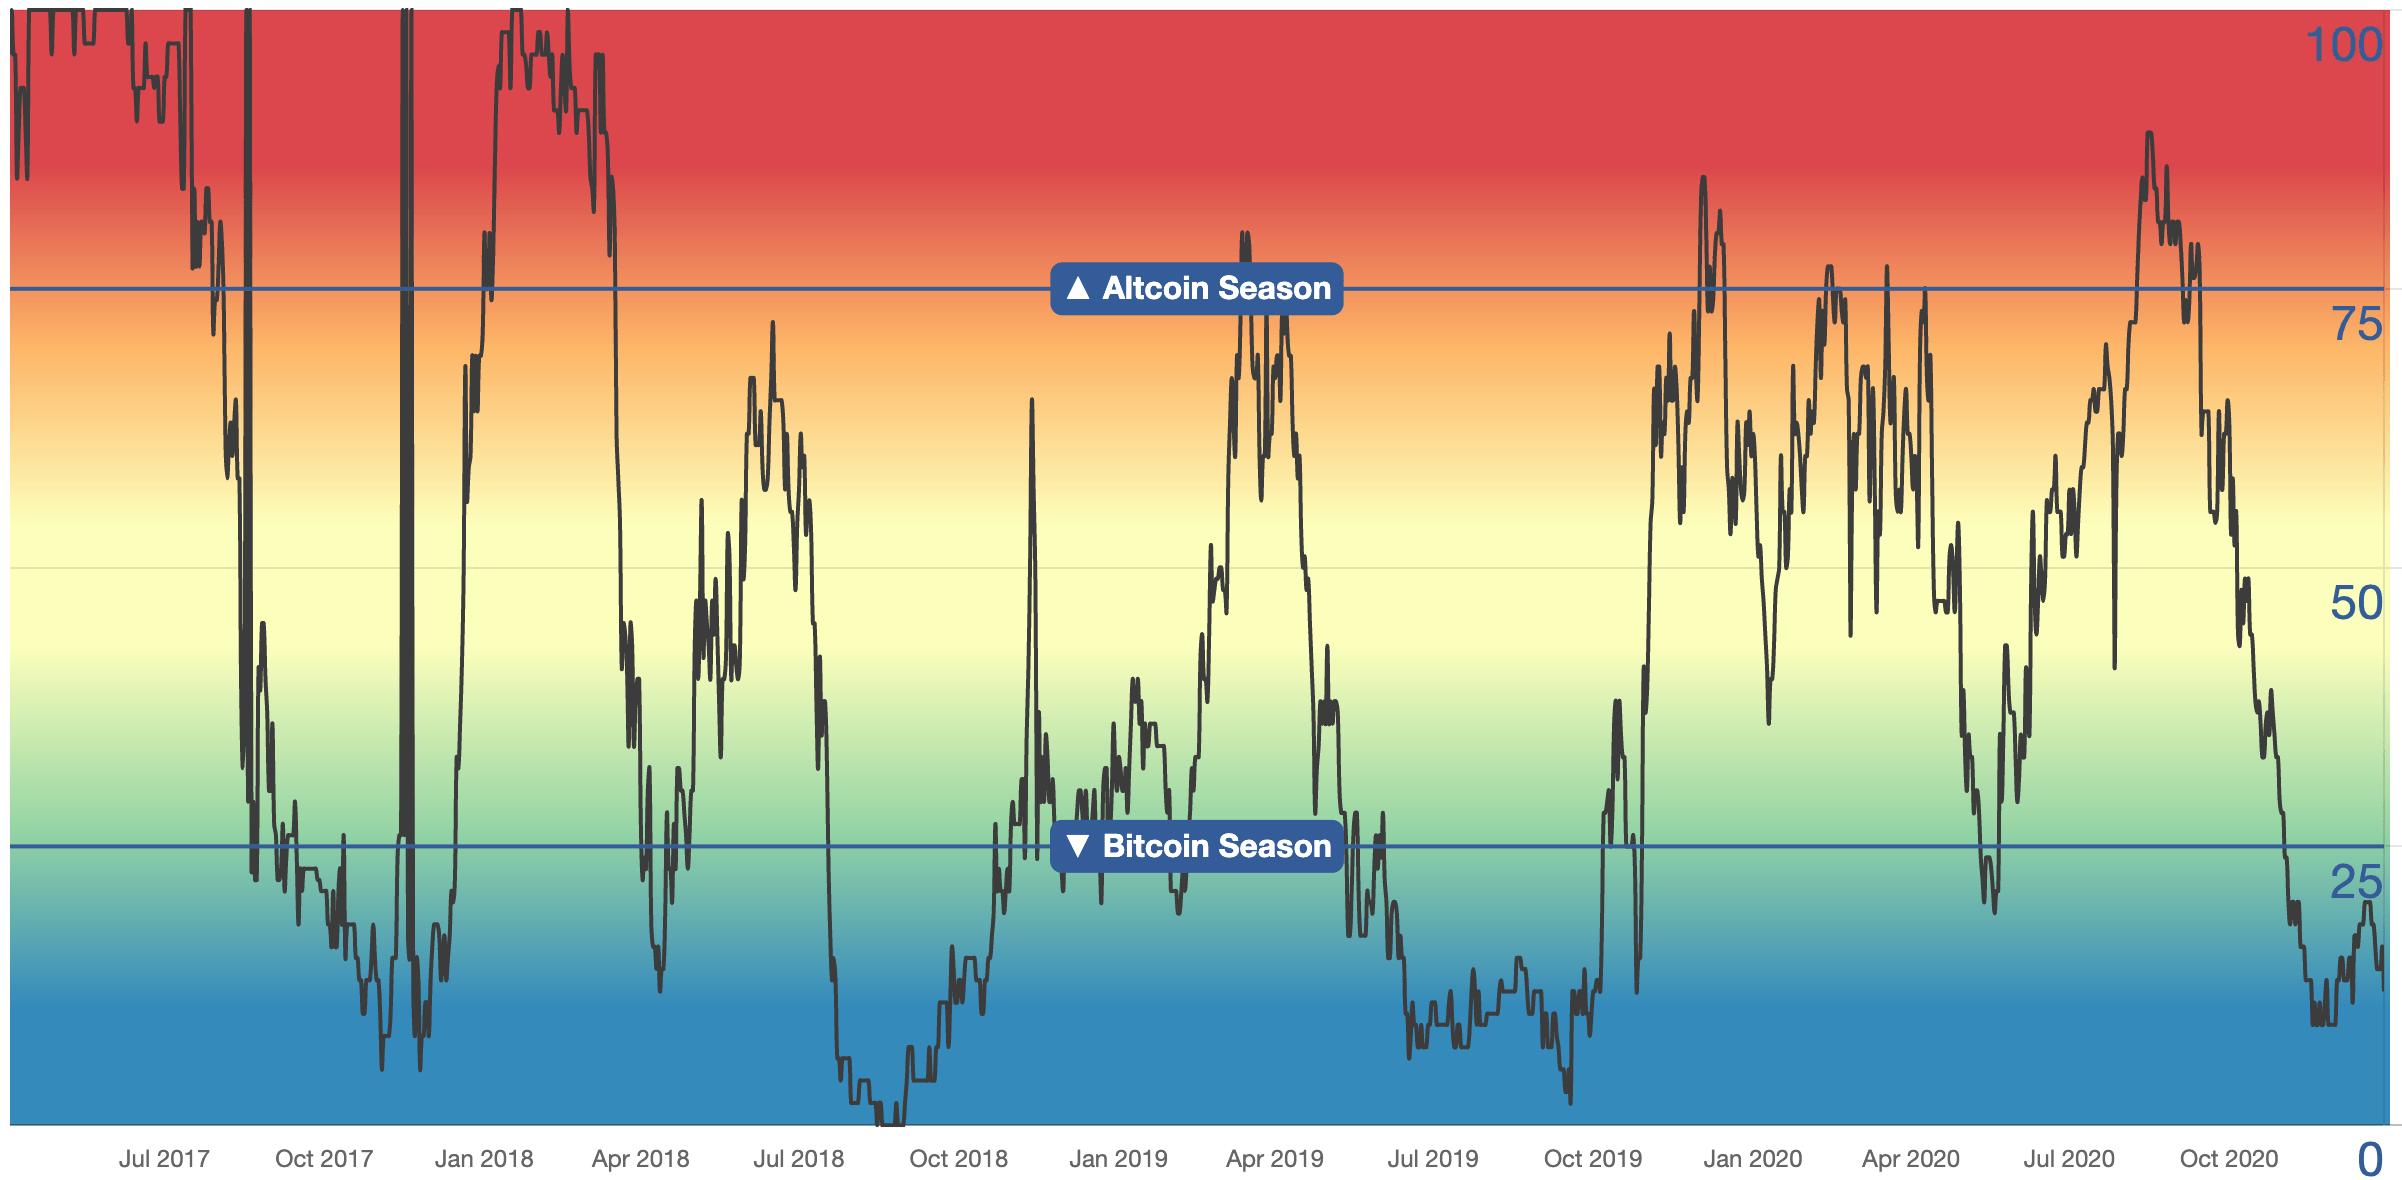 Indice Saison Altcoins Bitcoin Index